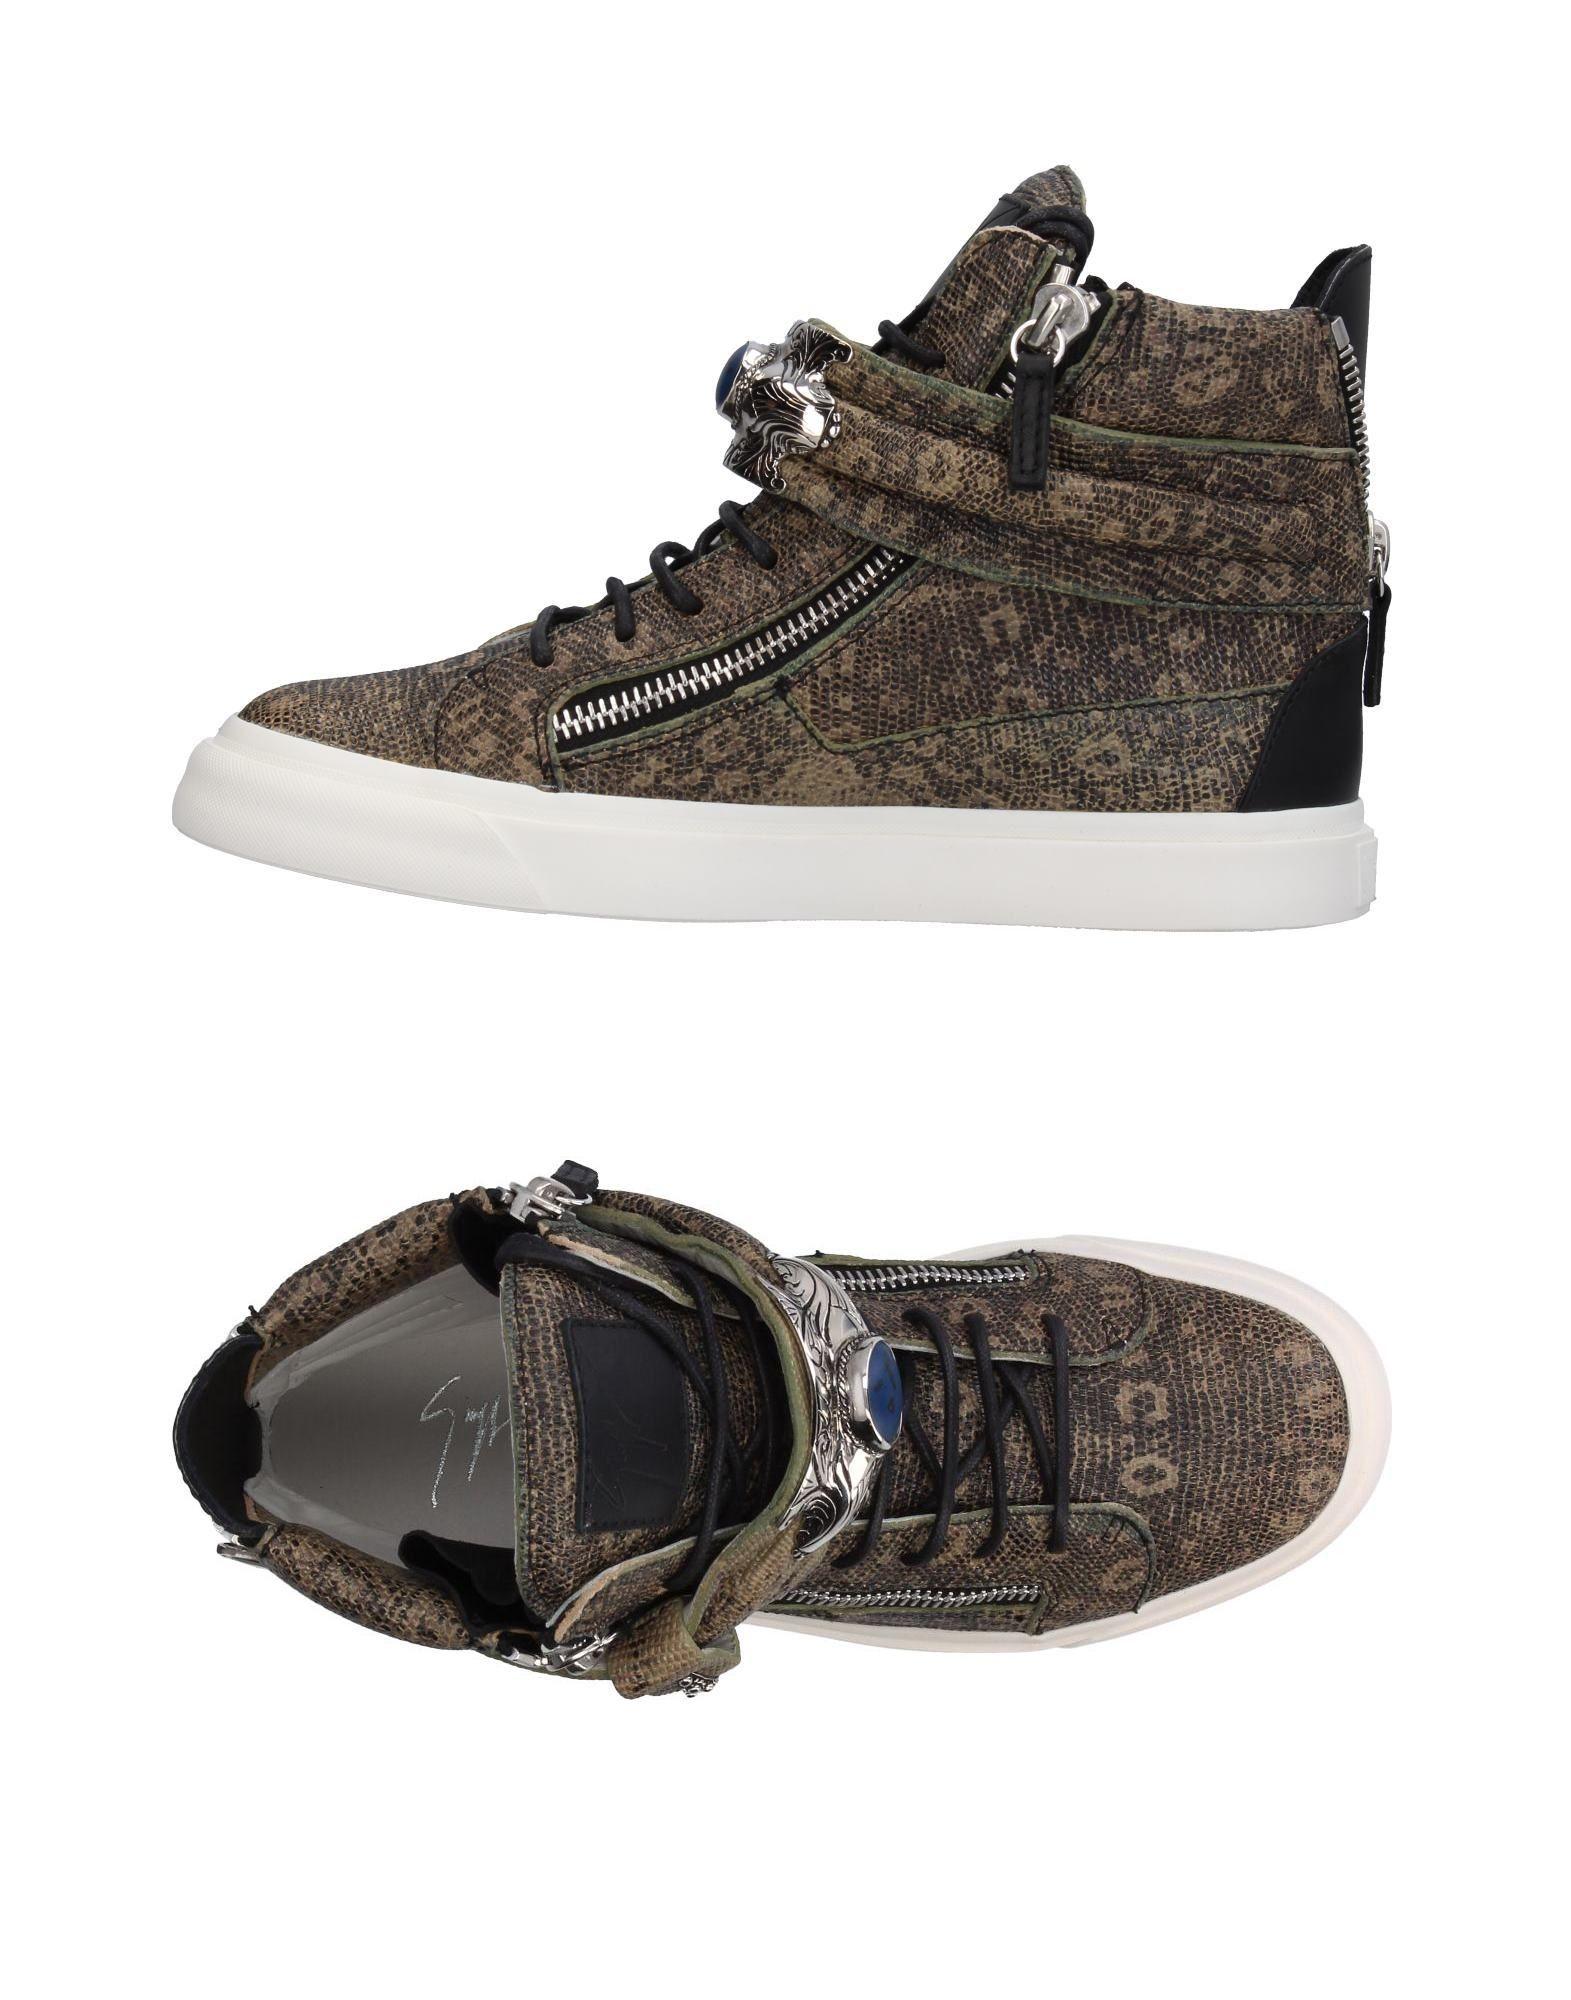 Giuseppe Zanotti Sneakers Herren  11377503BA Gute Qualität beliebte Schuhe